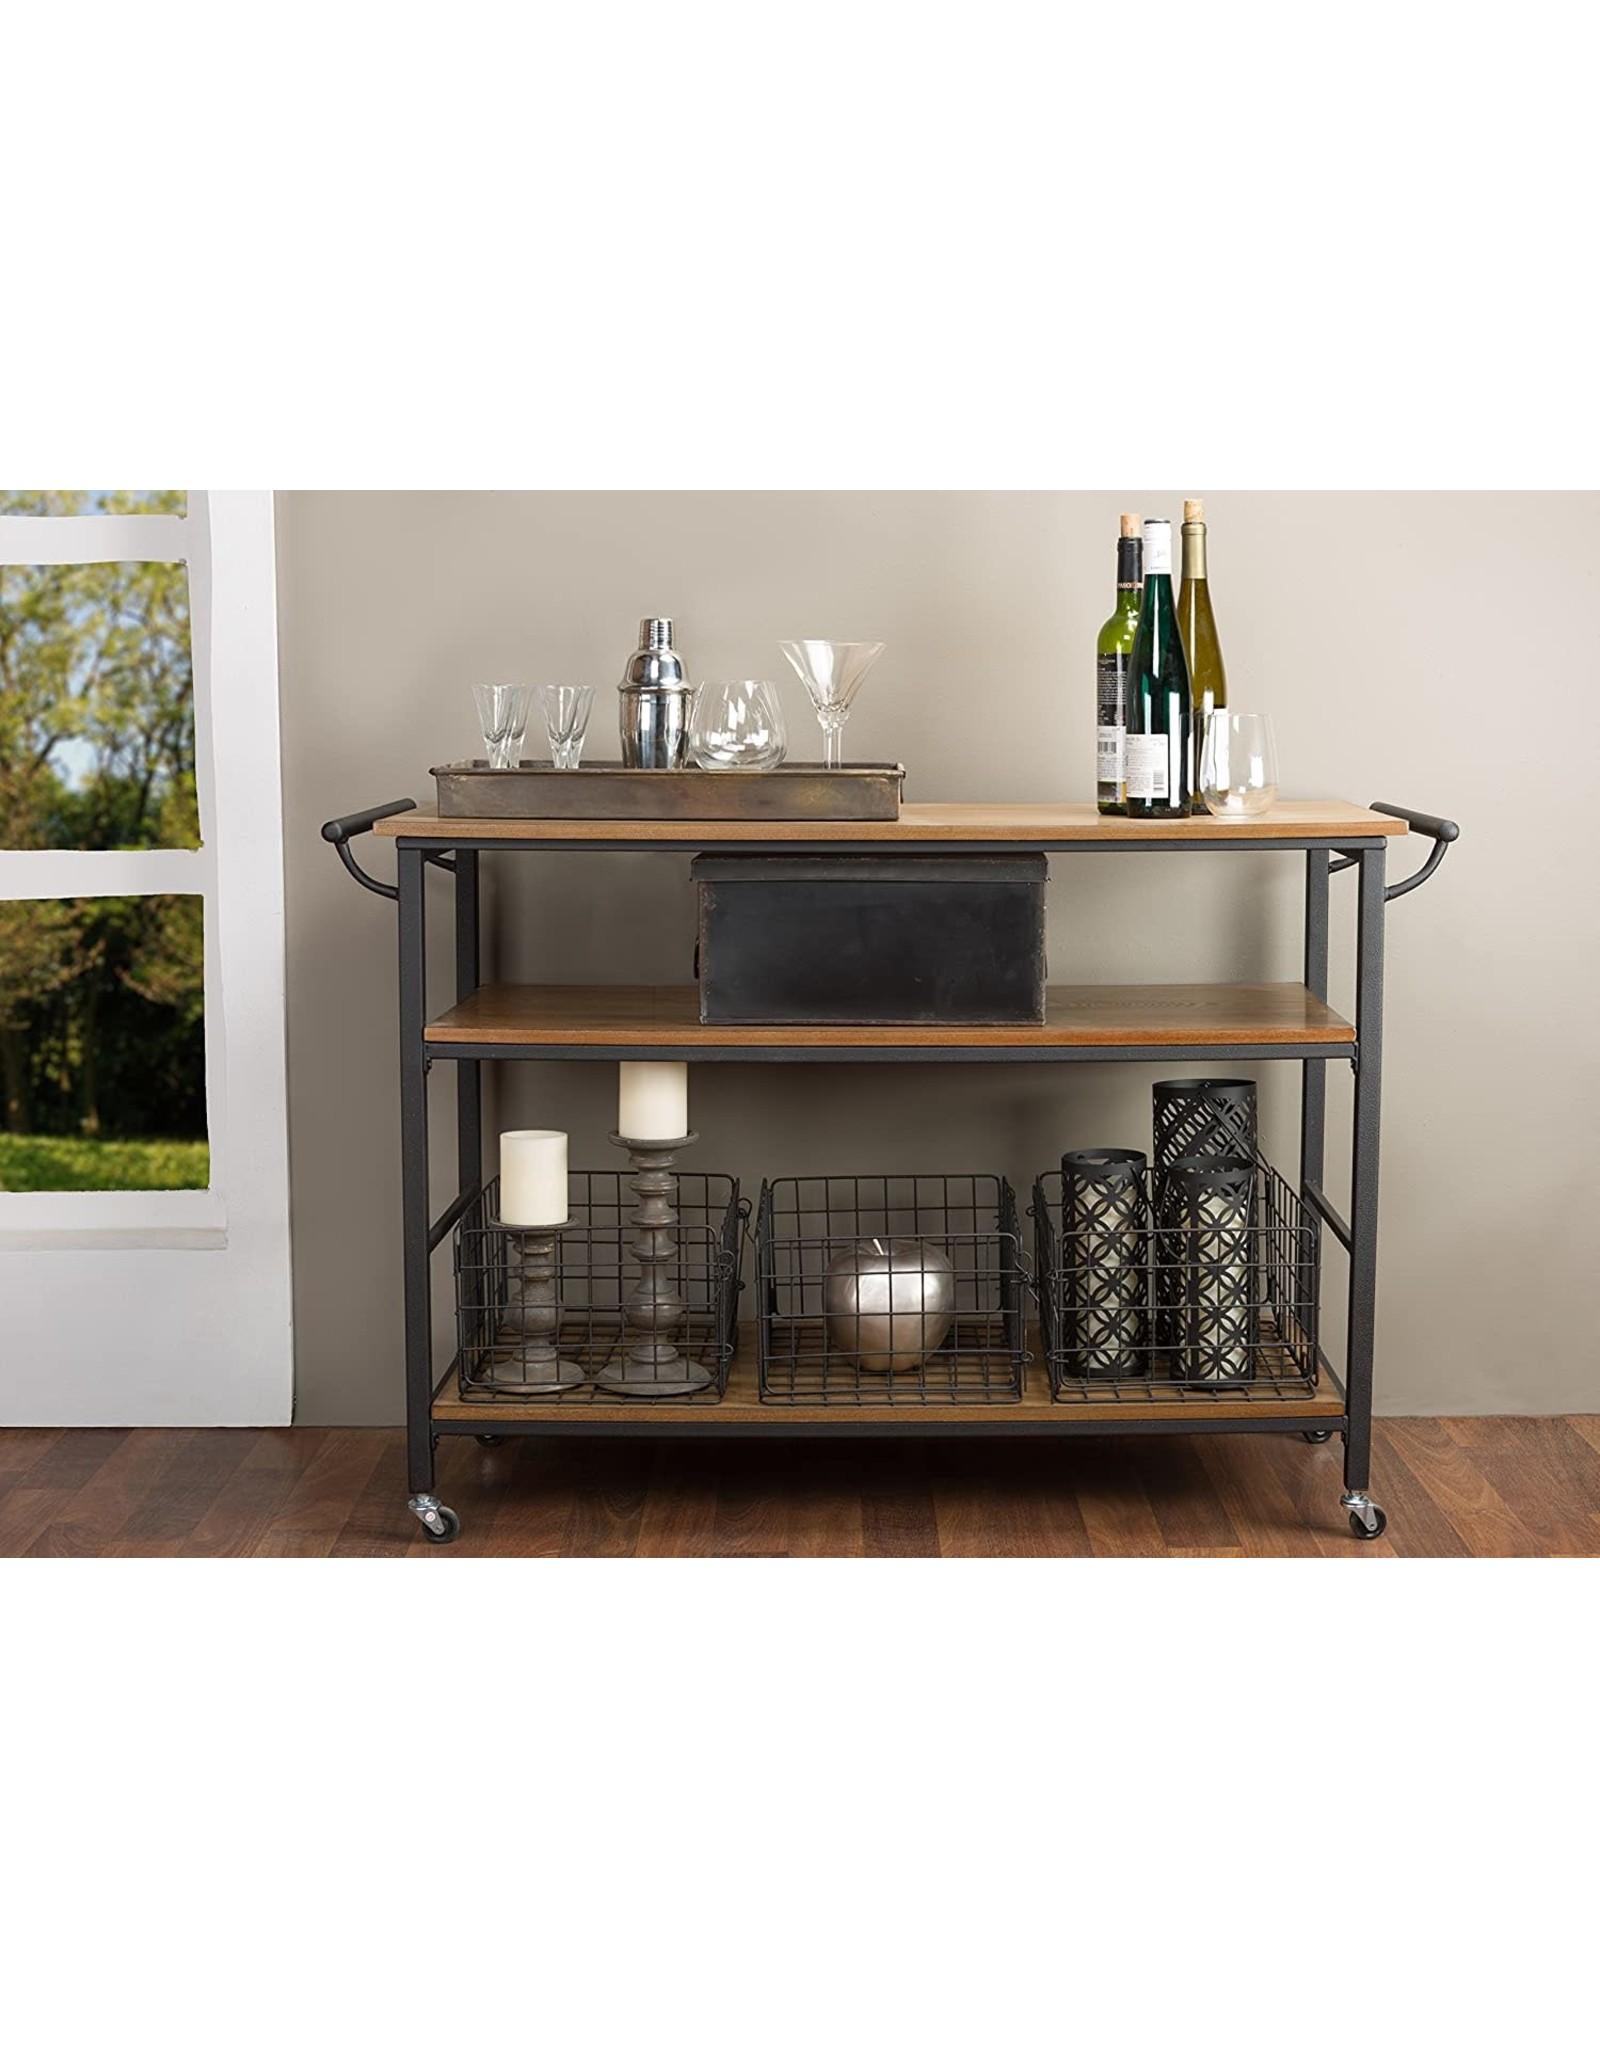 Baxton Studio Baxton Studio Lancashire Wood and Metal Kitchen Cart, Brown